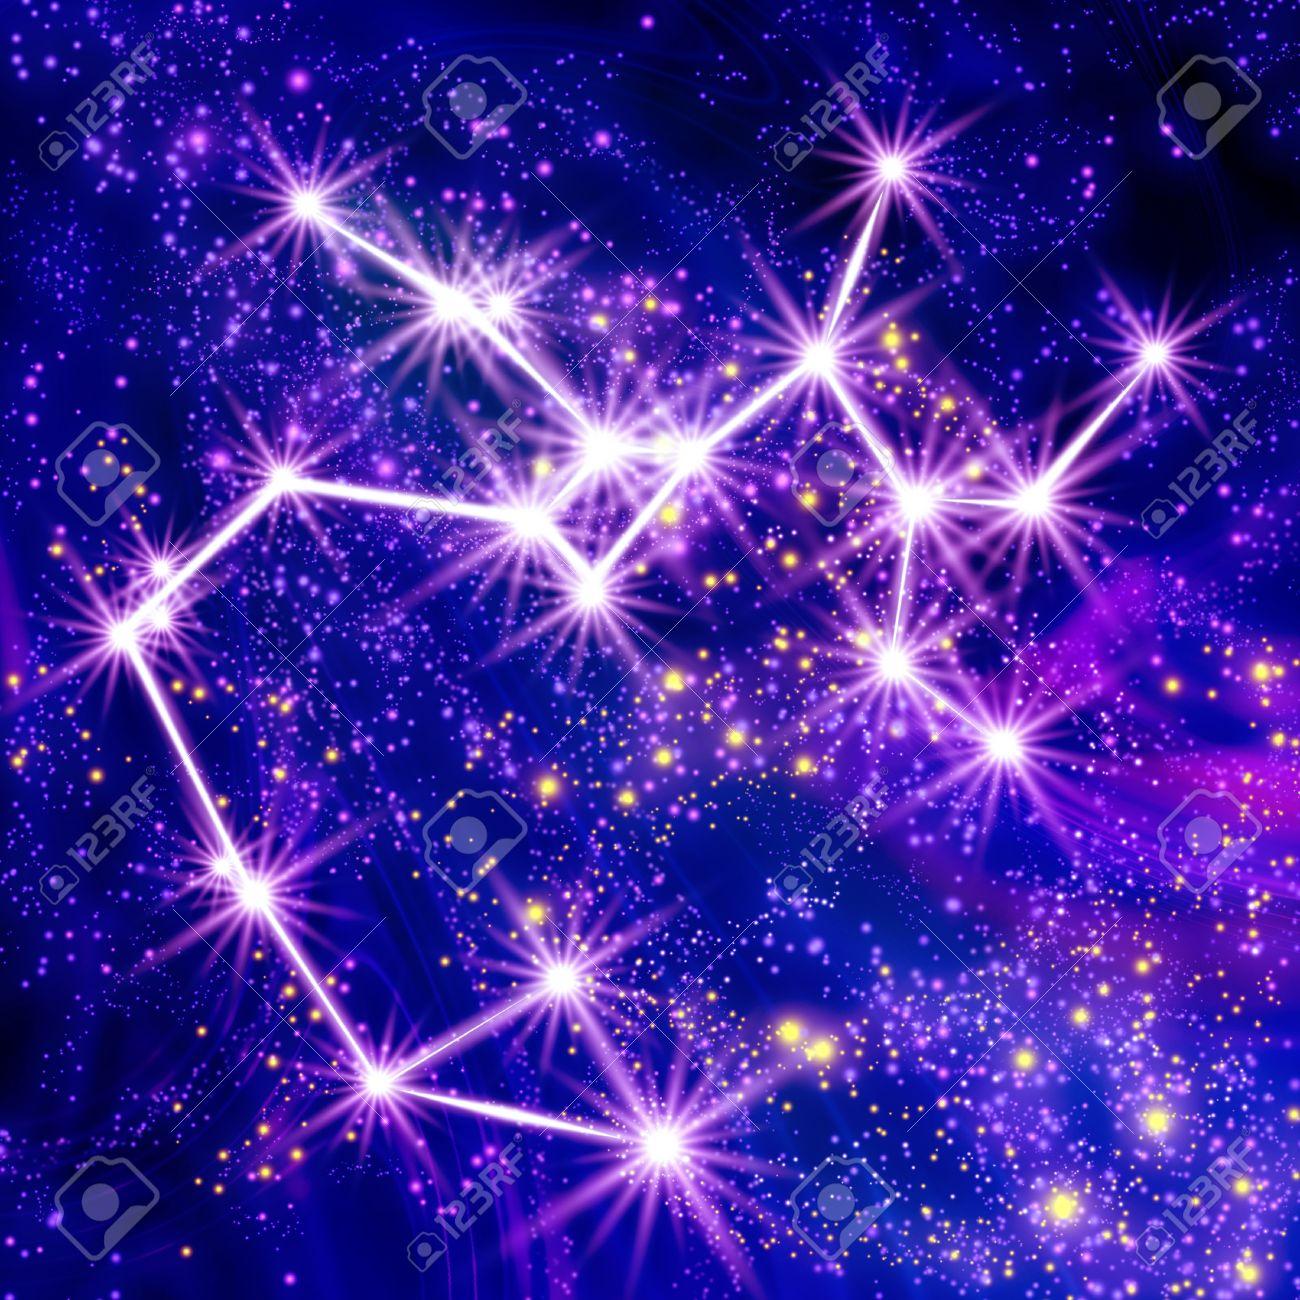 Constellation Sagittarius in the sky Stock Photo - 18829645